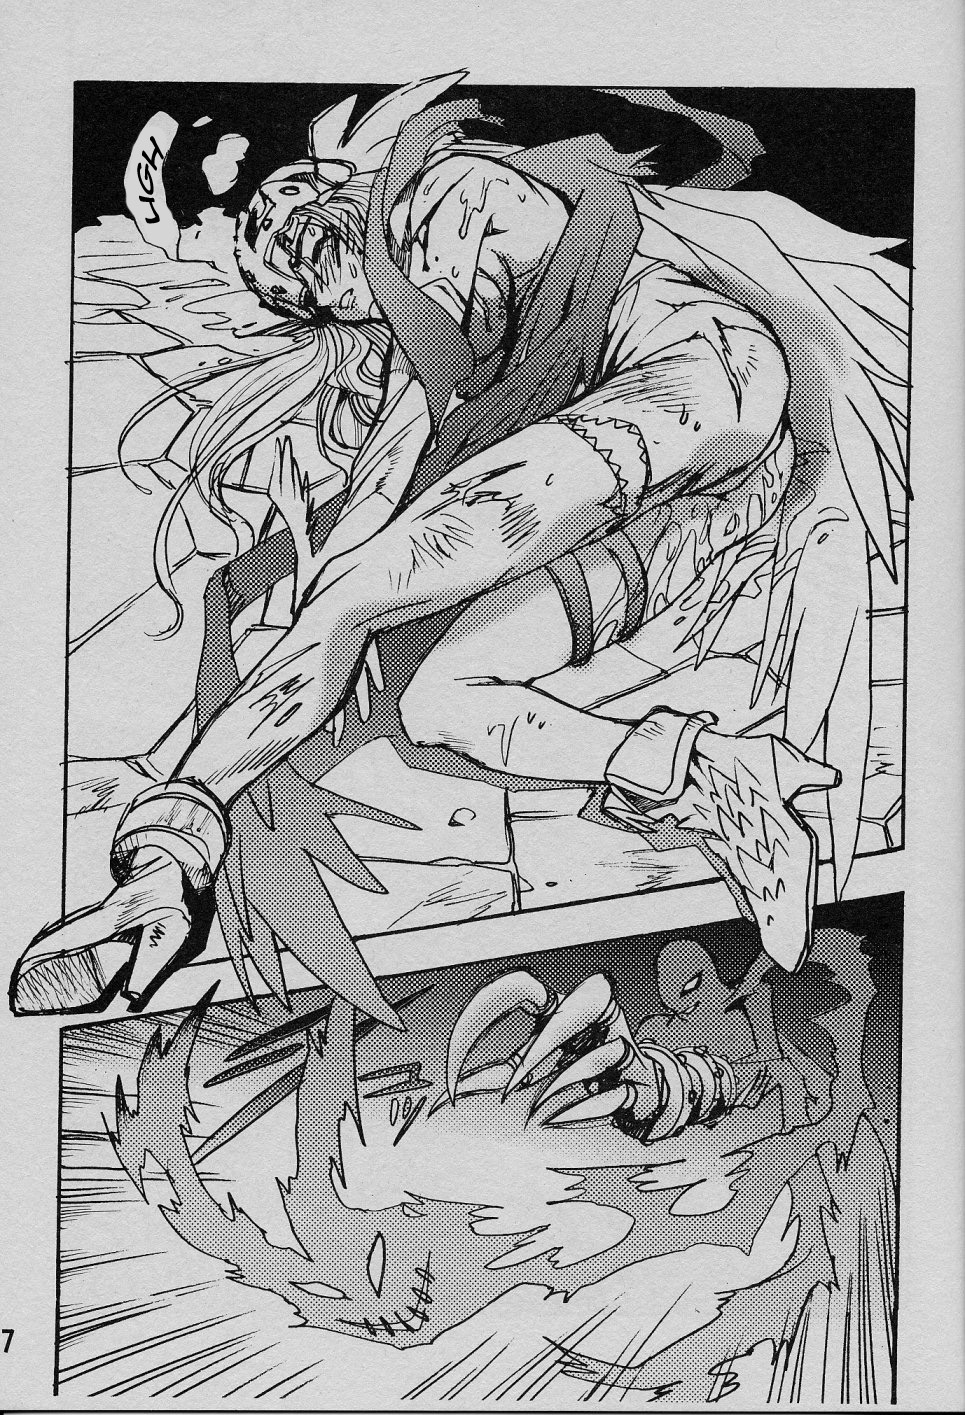 Digimon Hentai Pornô: O anjo caído - Foto 16